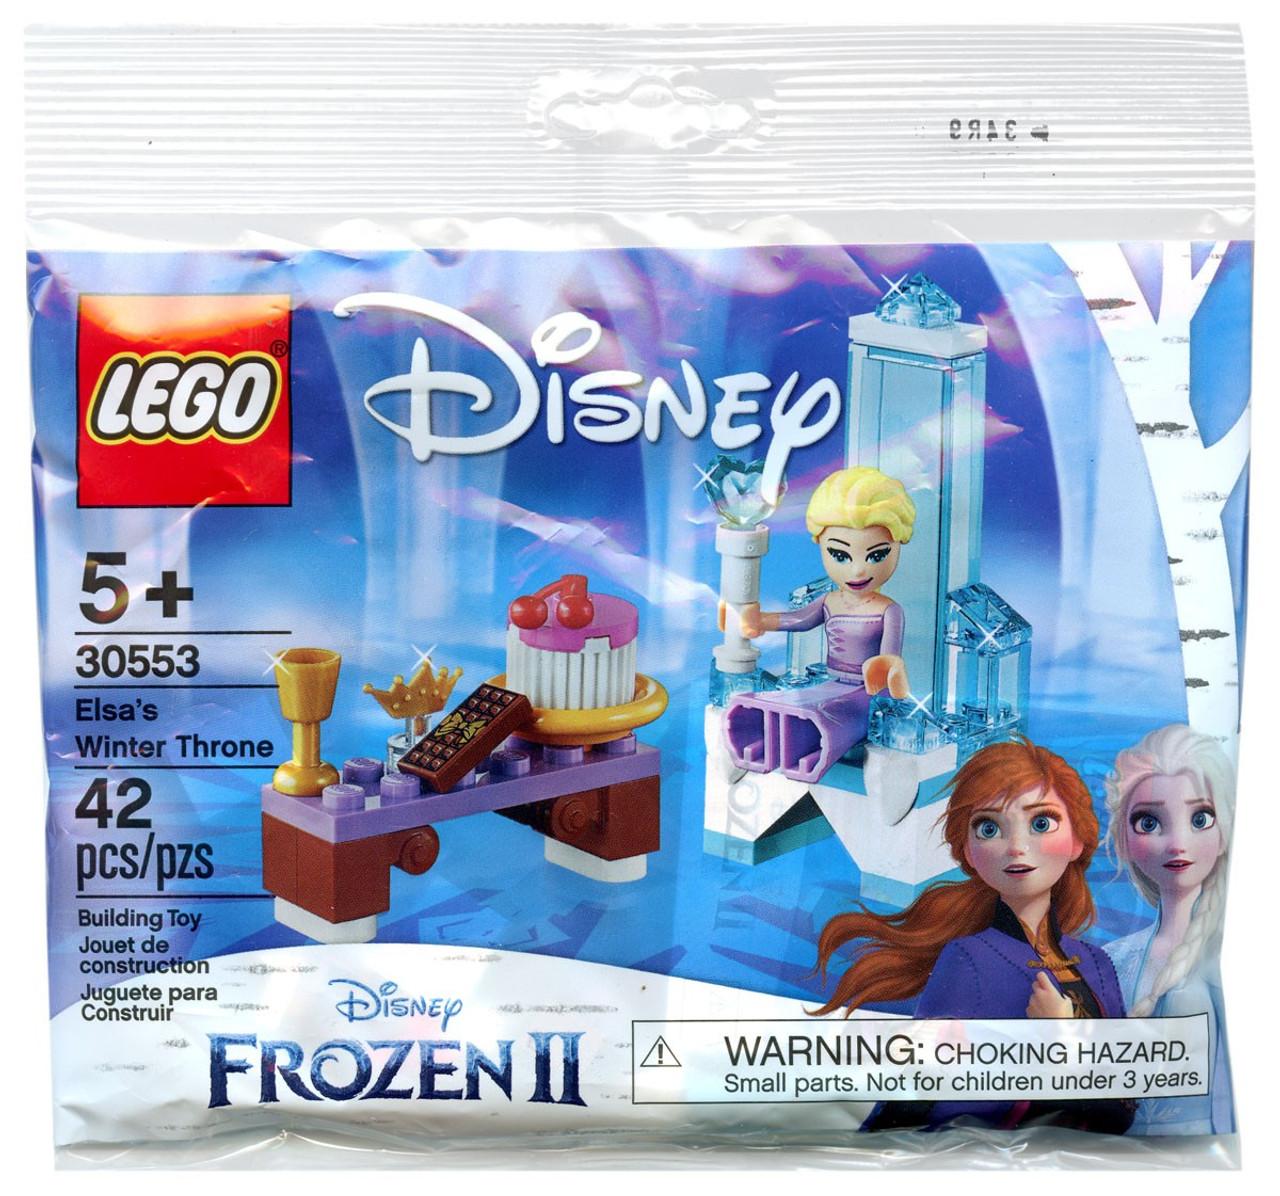 Lego Disney Princess Disney Frozen 2 Elsas Winter Throne Set 30553